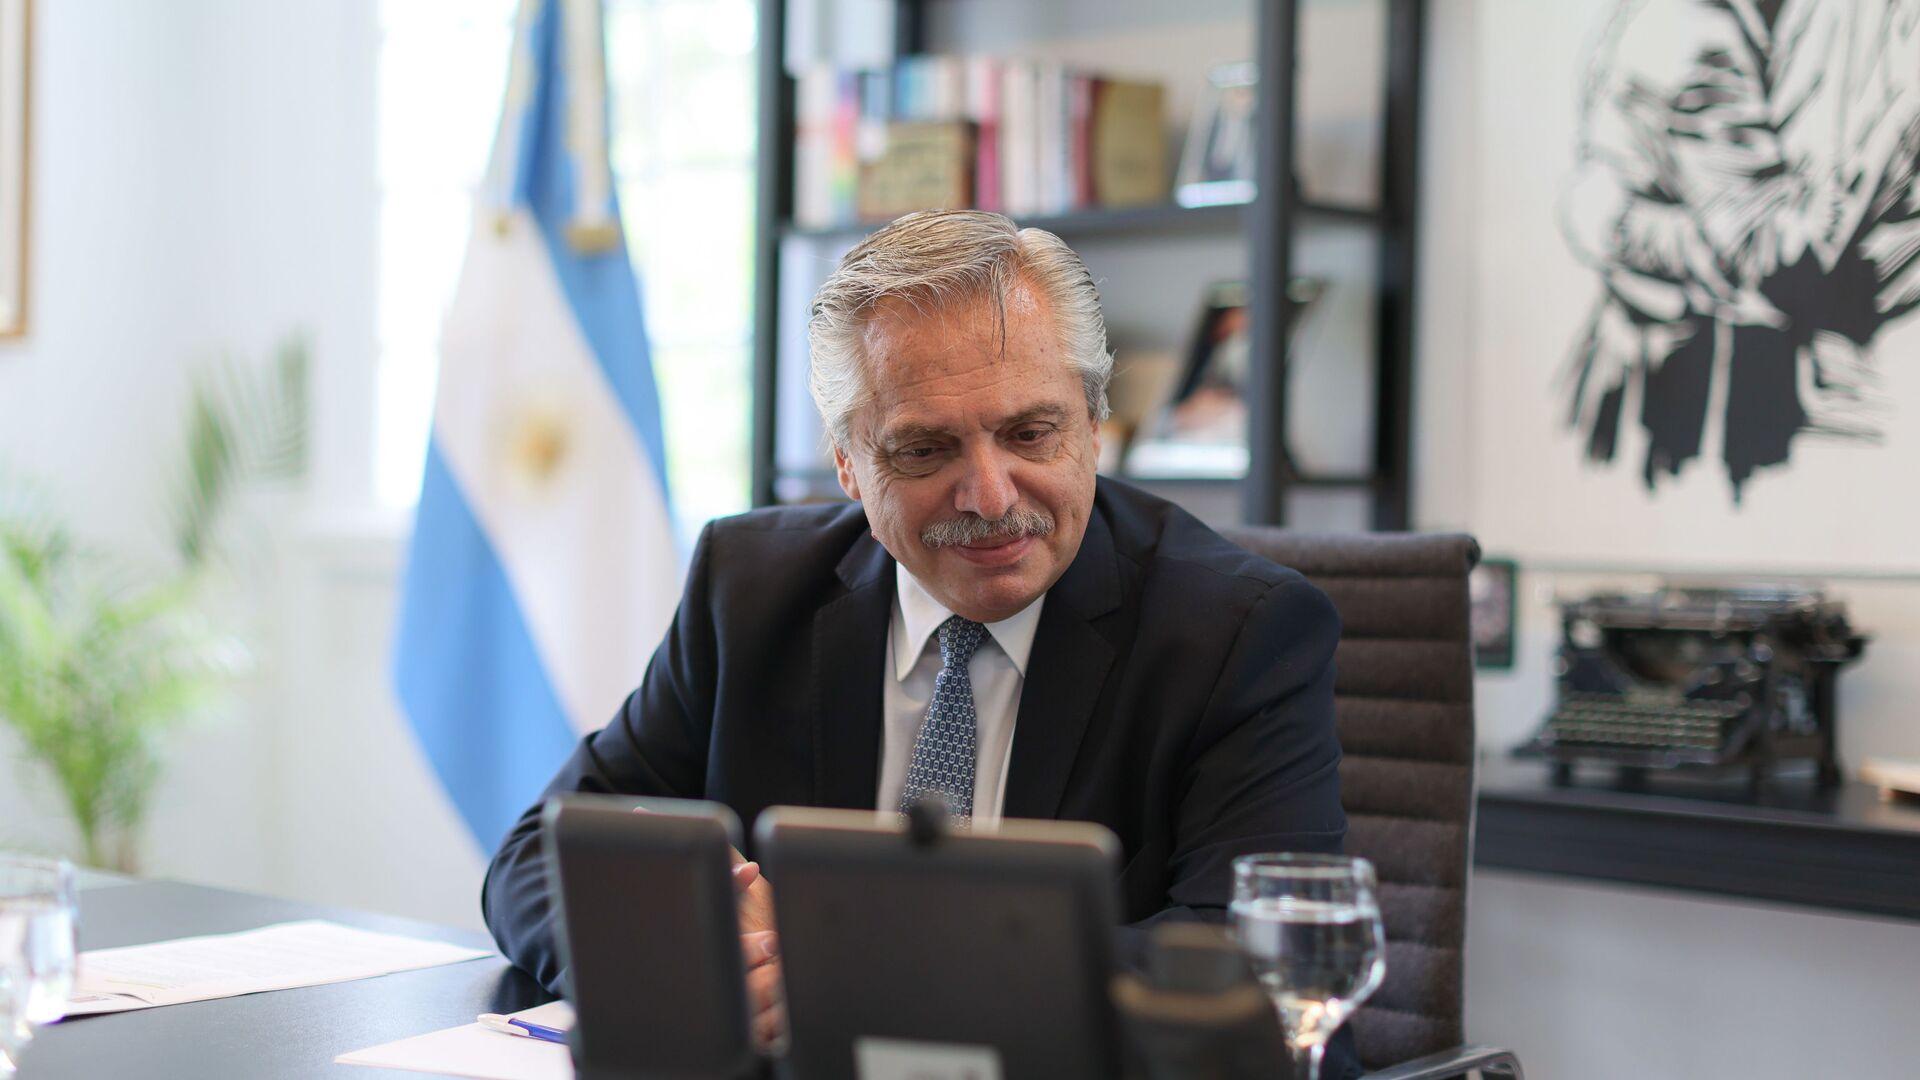 Alberto Fernández, presidente de Argentina - Sputnik Mundo, 1920, 27.03.2021